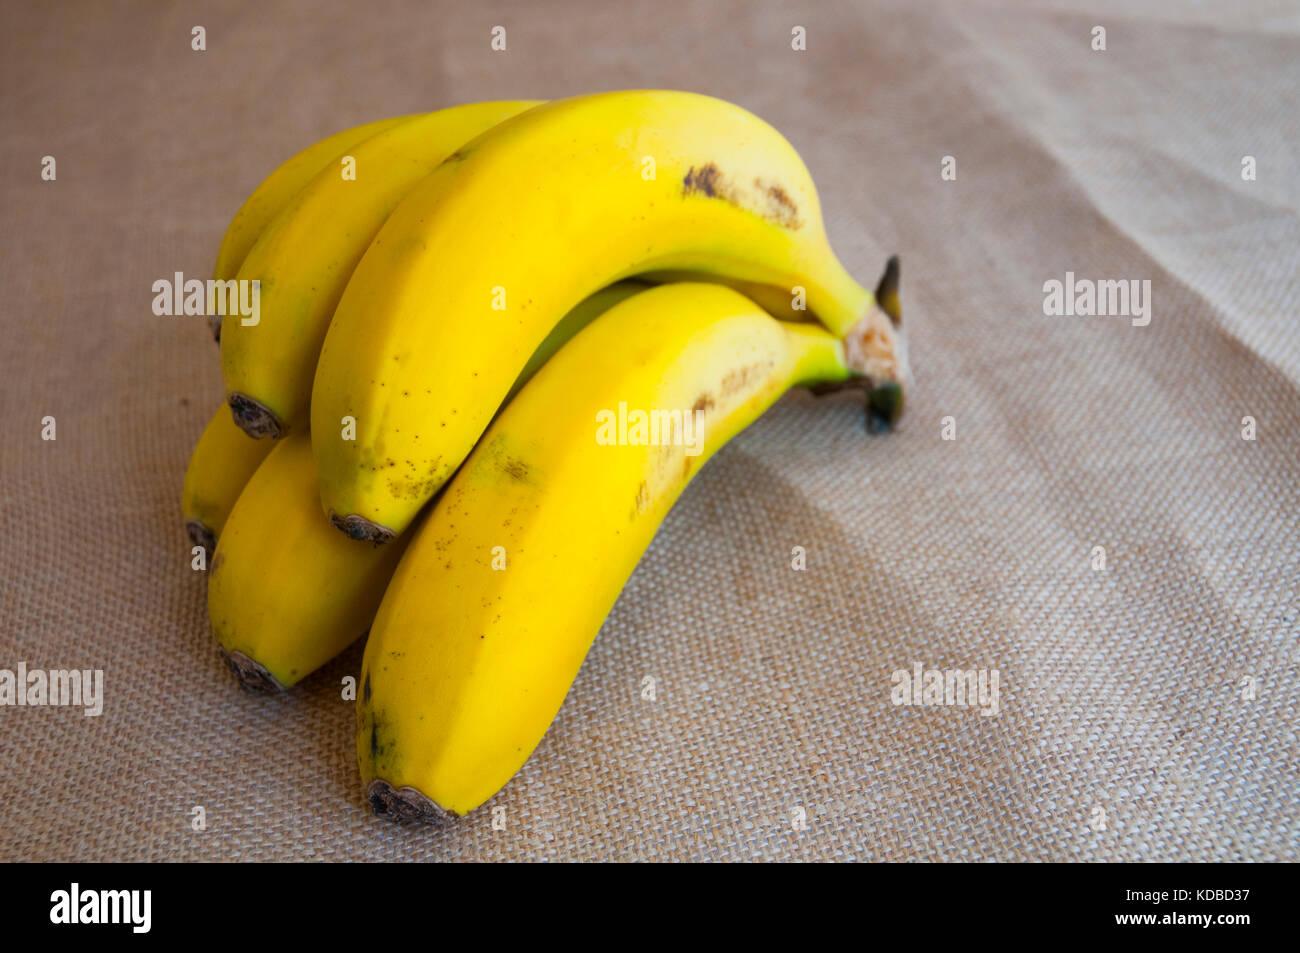 Bündel Bananen. Kanarische Inseln, Spanien. Stockbild